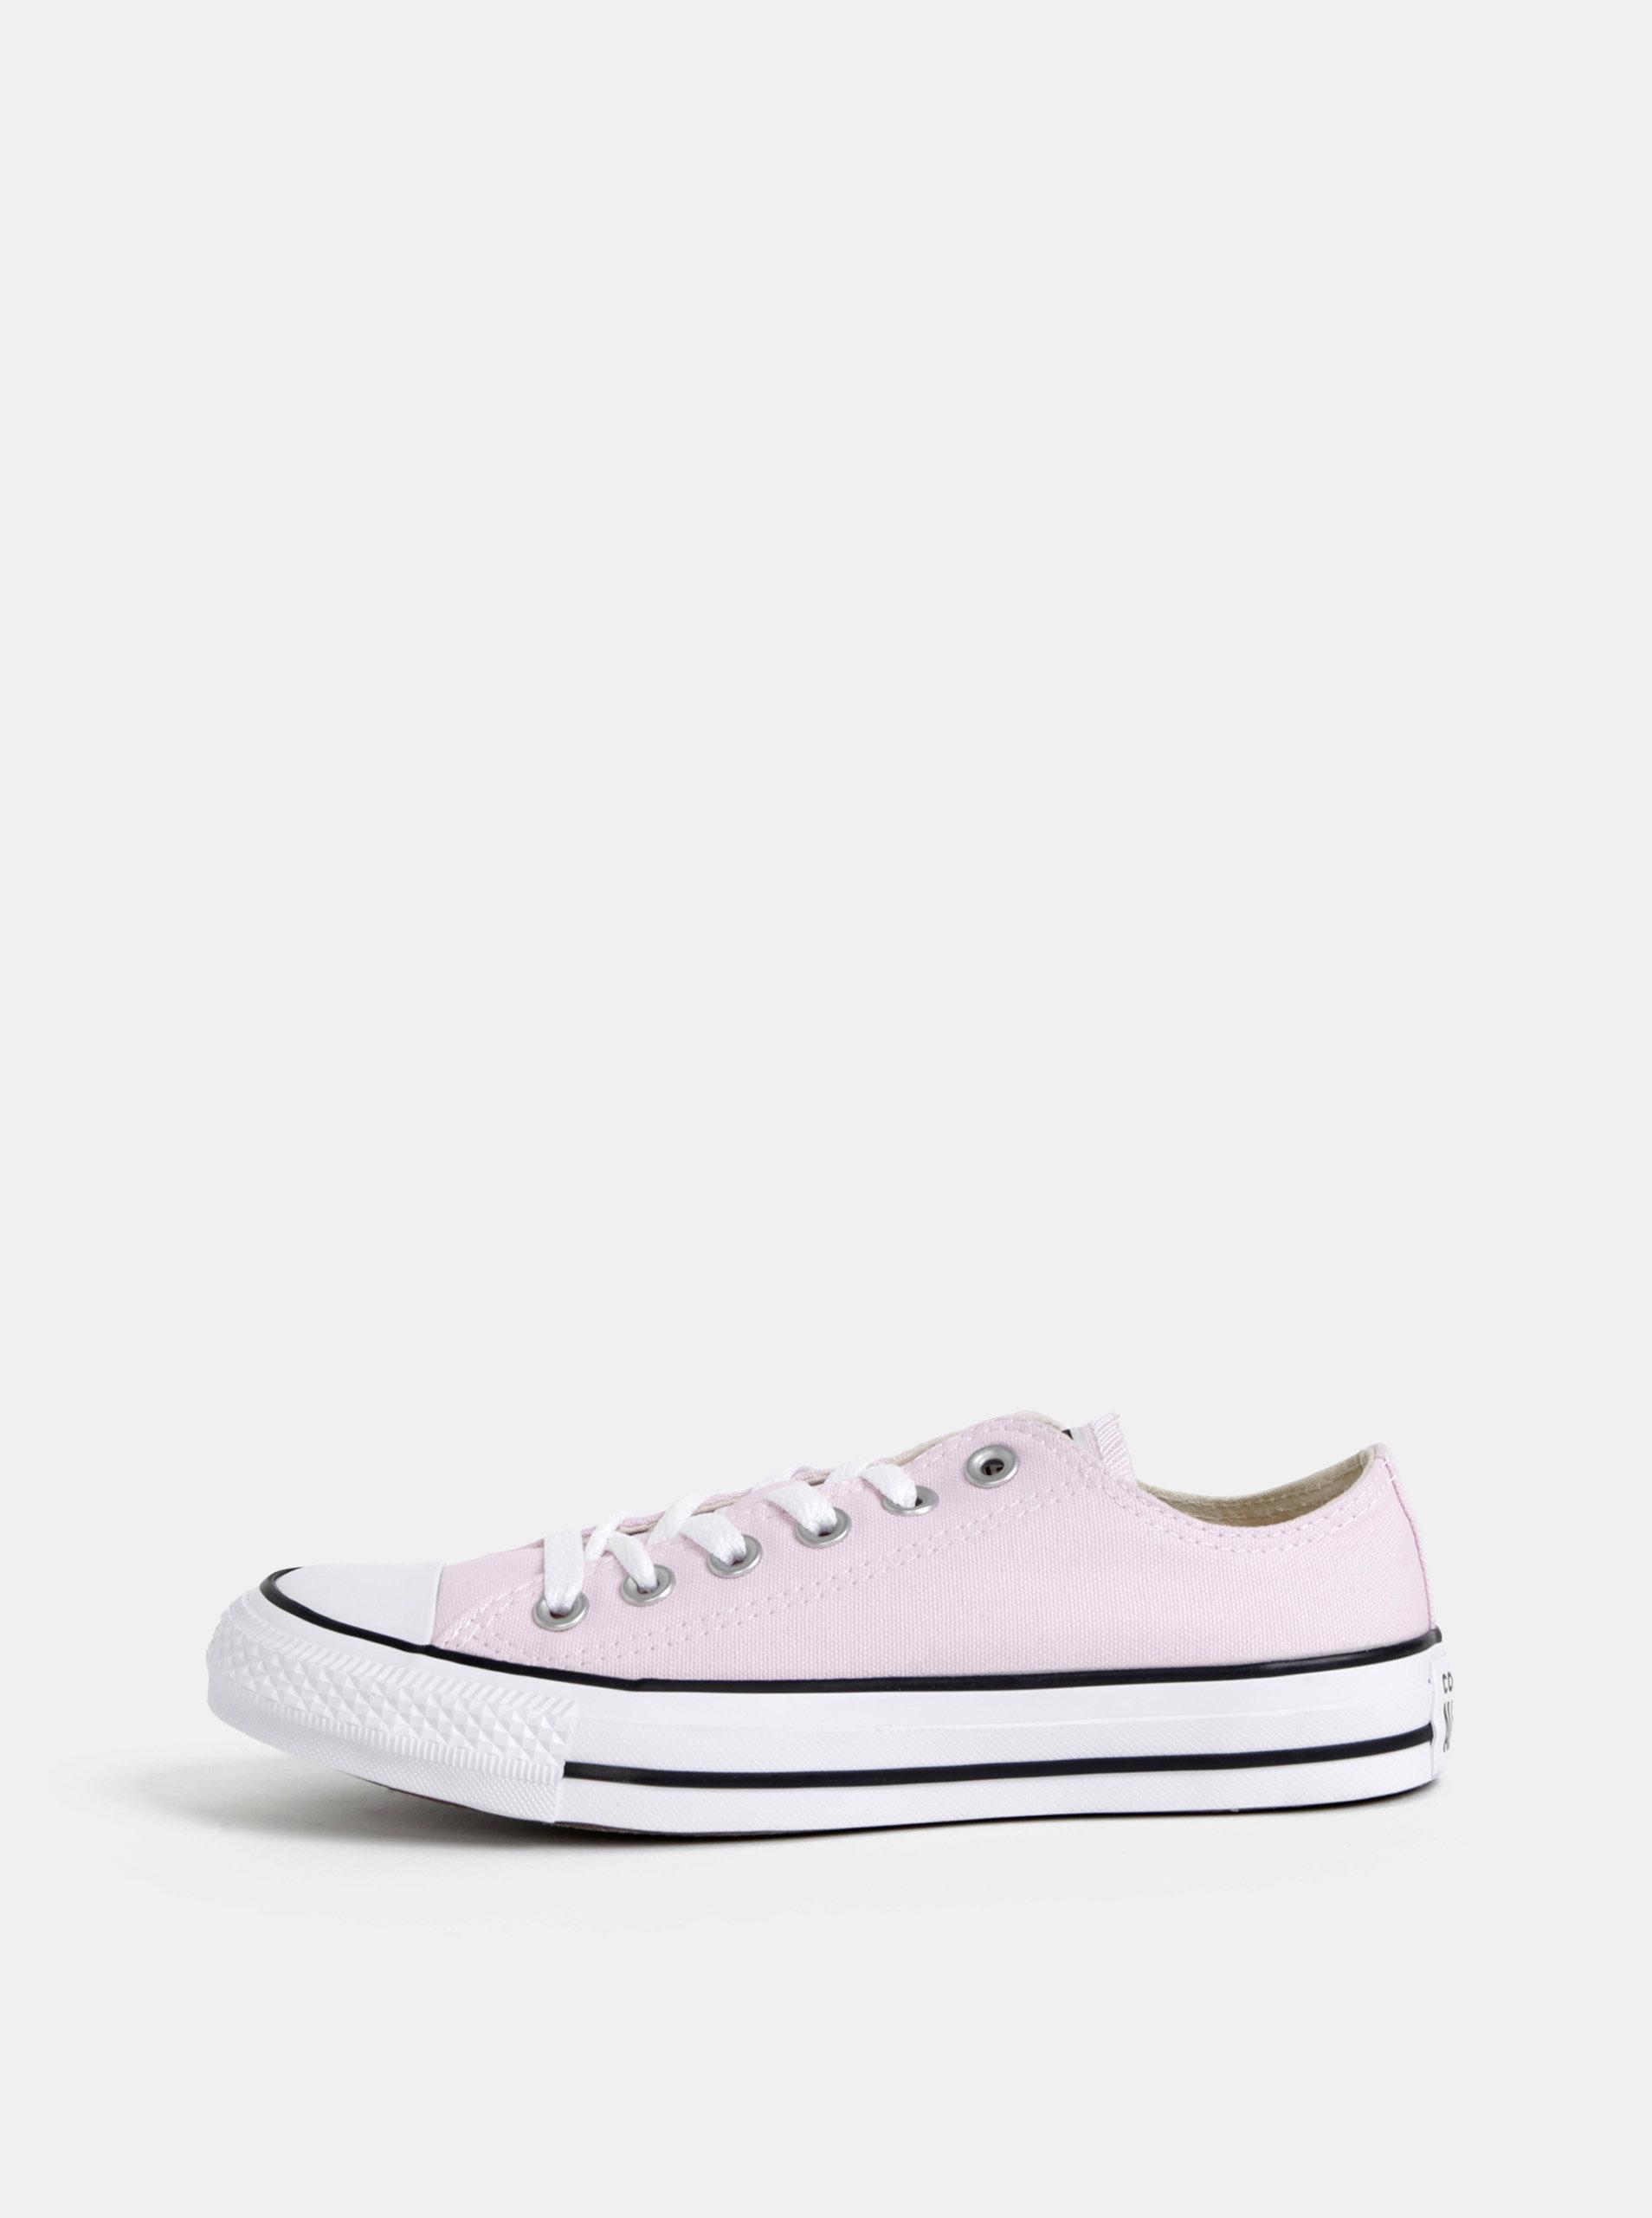 b4facc6a84 Světle růžové dámské tenisky Converse Chuck Taylor All Star ...